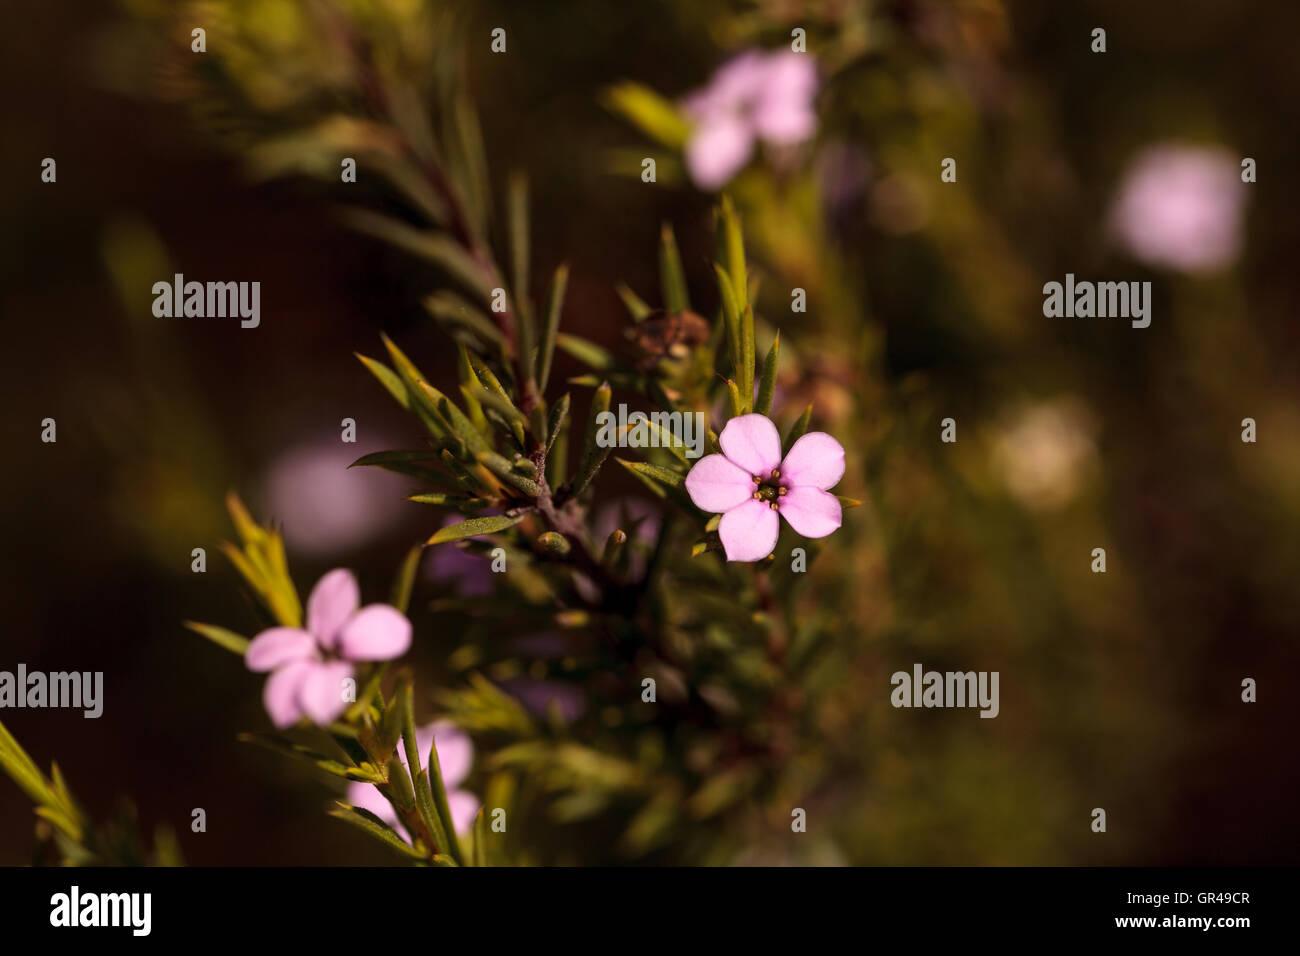 Tiny pink flowers on a leptospermum tea tree bush growing in a stock tiny pink flowers on a leptospermum tea tree bush growing in a botanical garden in summer mightylinksfo